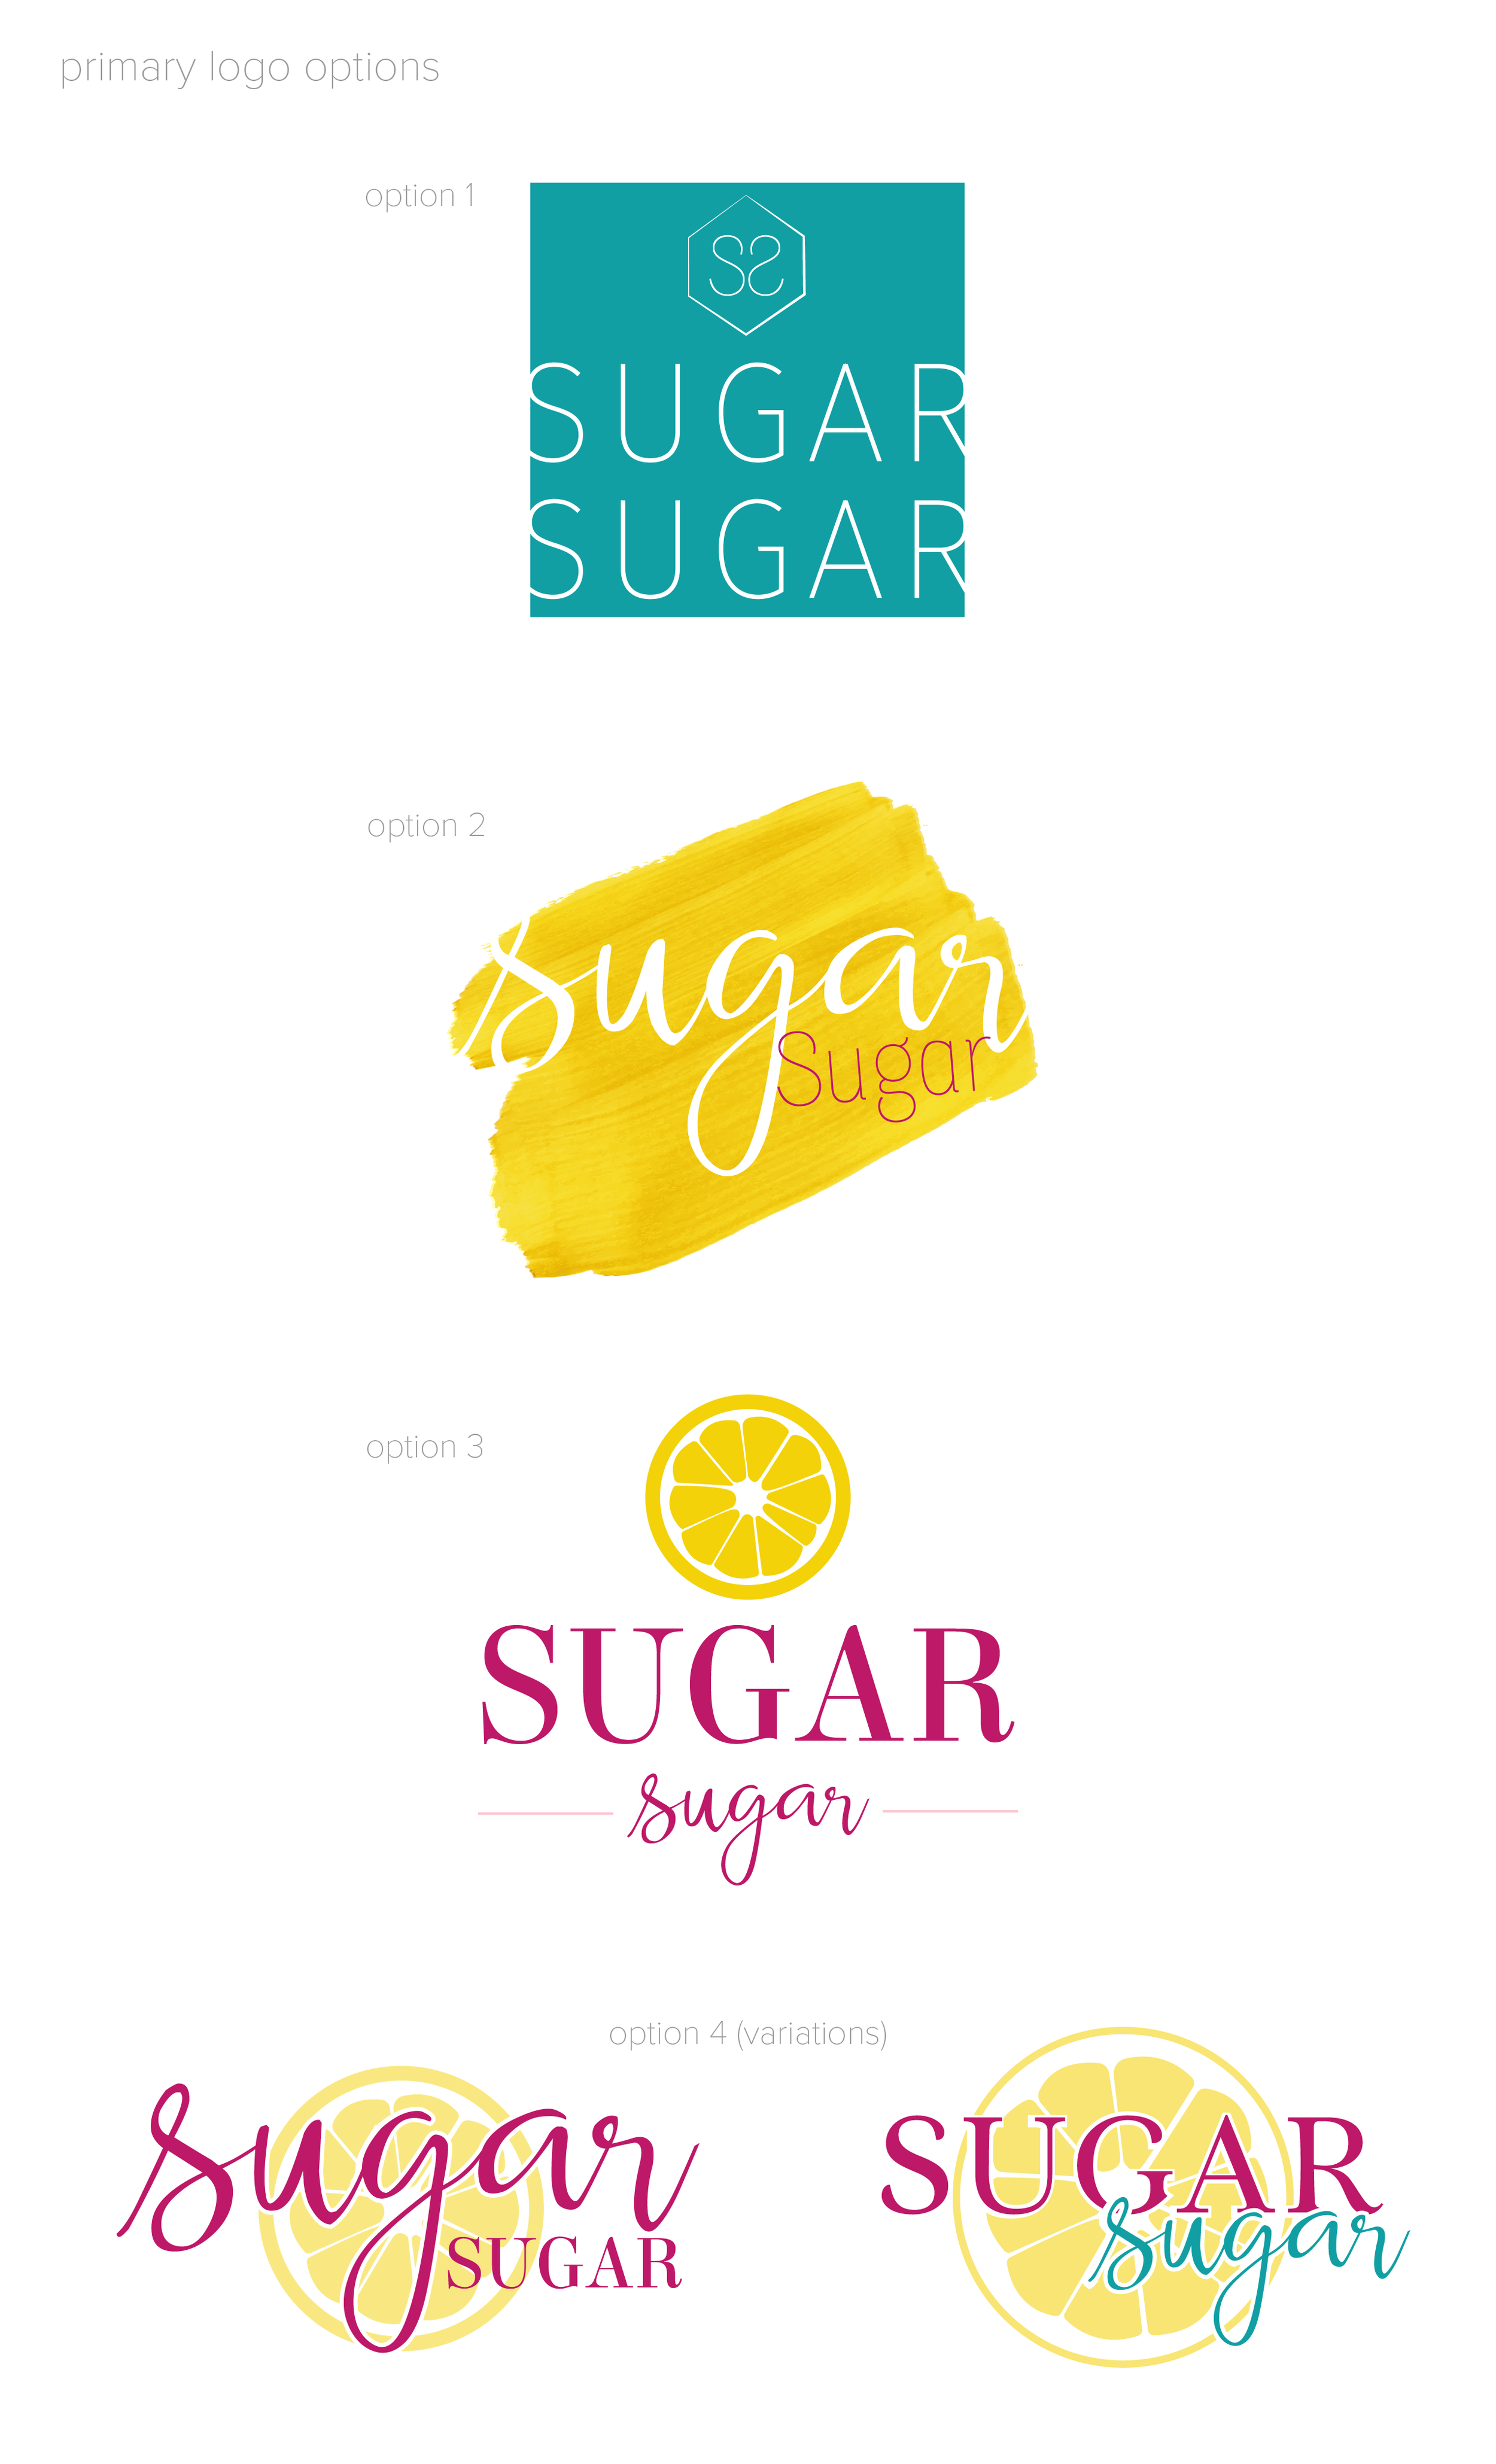 Sugar Sugar Portland Logo Concepts by Brightly & Co.